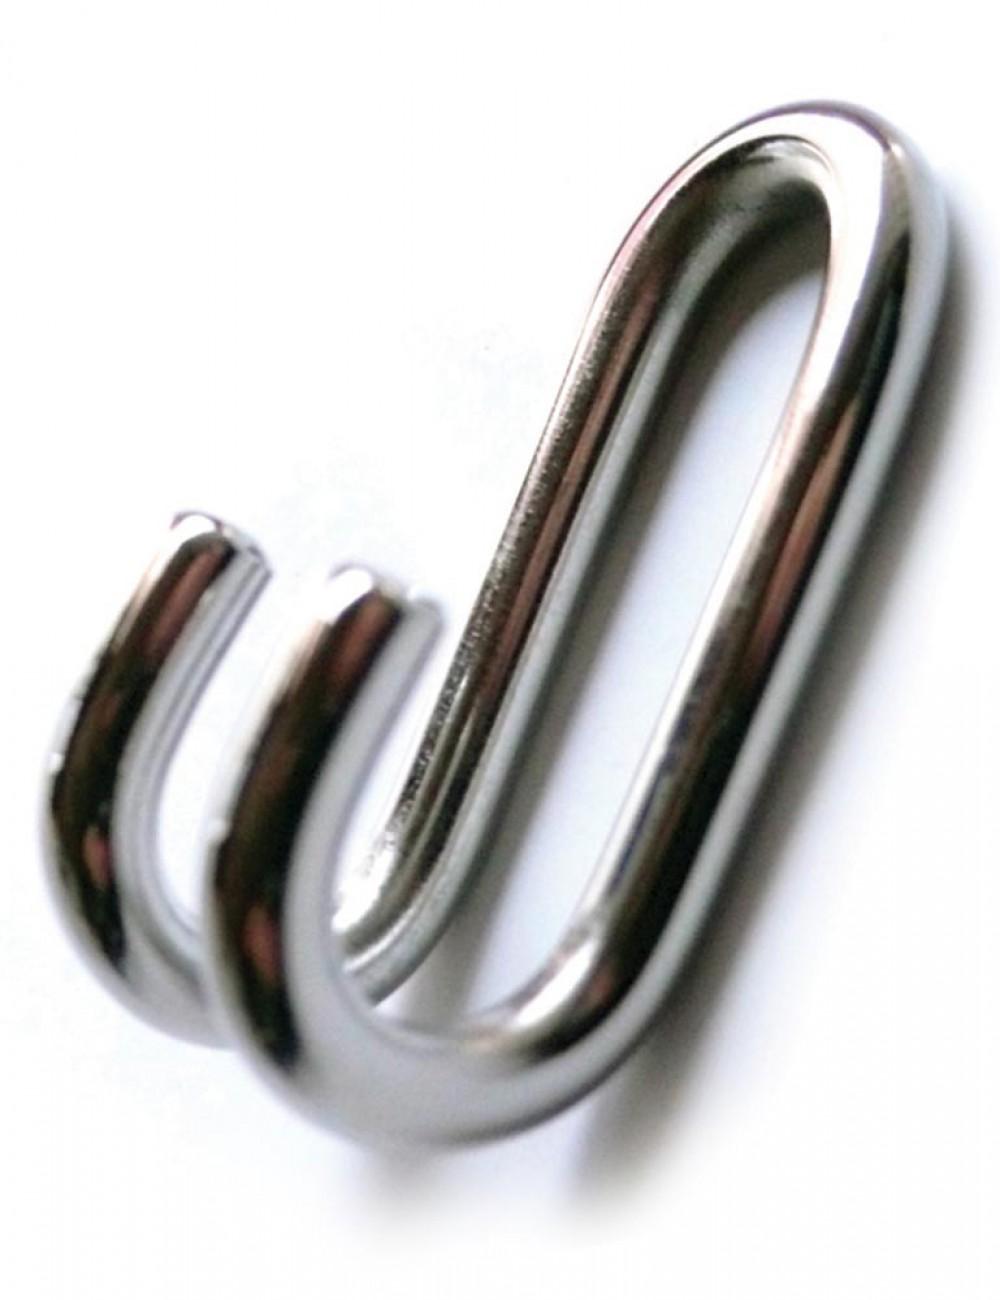 Steel Nose Hook